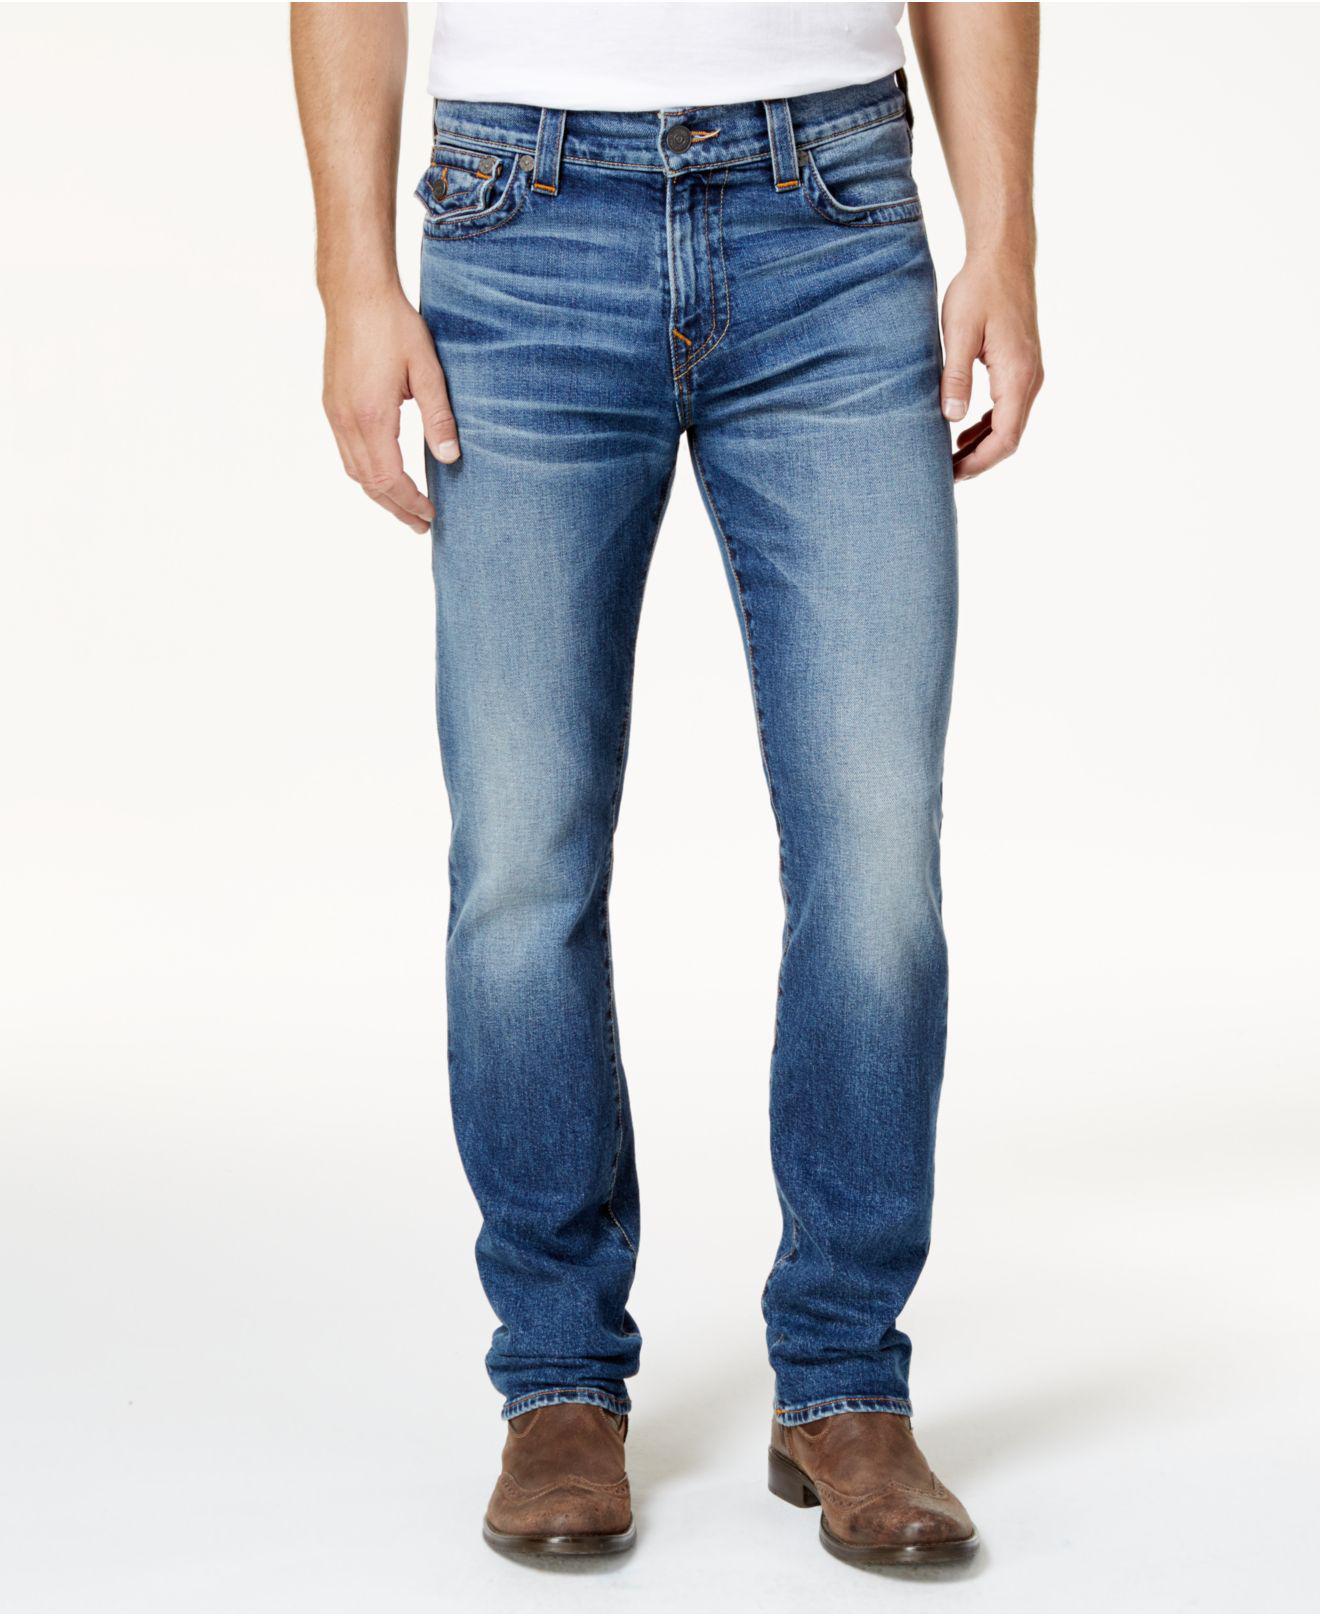 0f051423a Lyst - True Religion Men s Indigo Jeans in Blue for Men